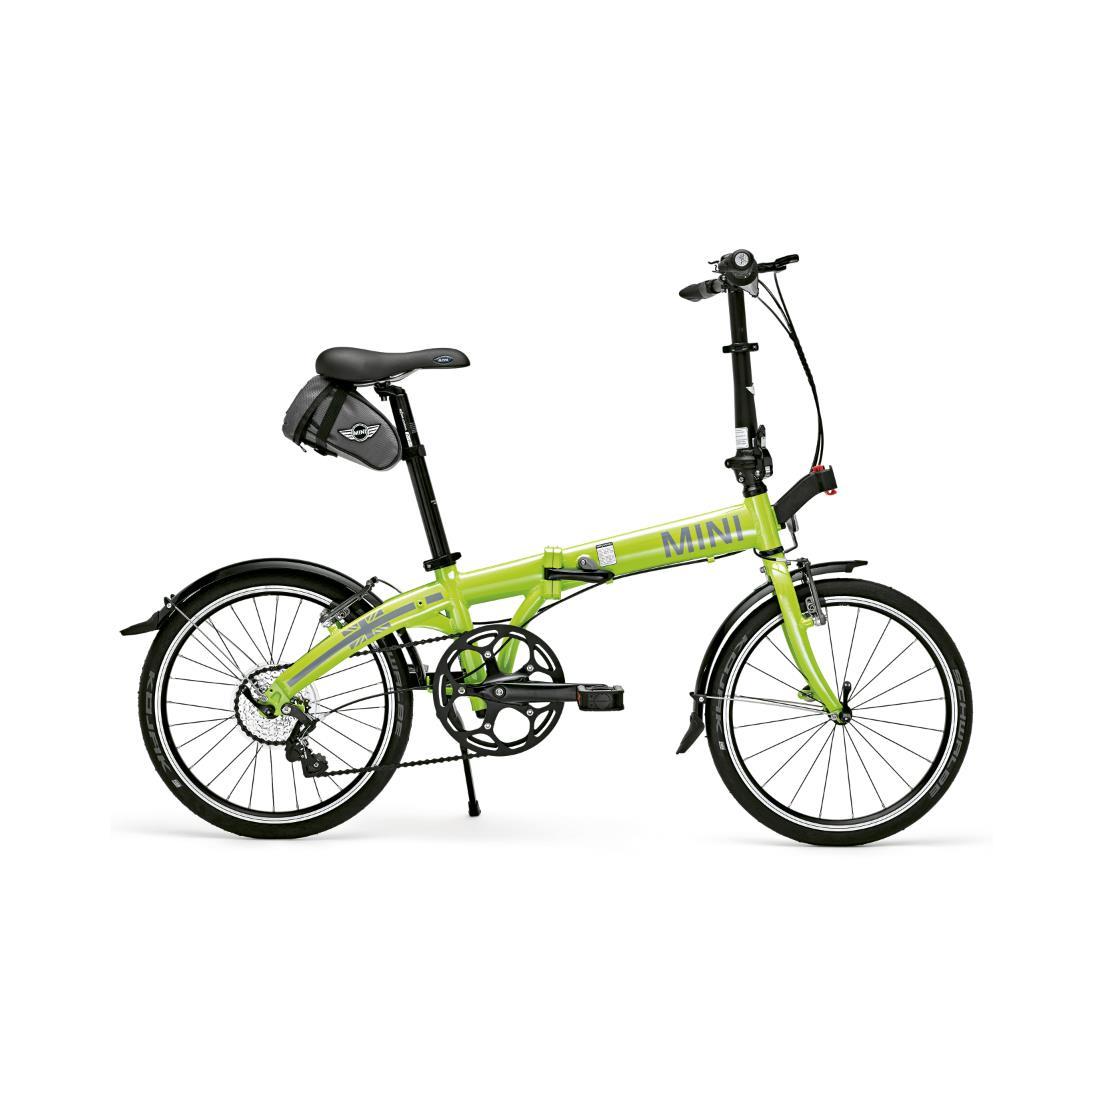 ShopMINIUSA.com: MINI Folding Pocket Bike Lime